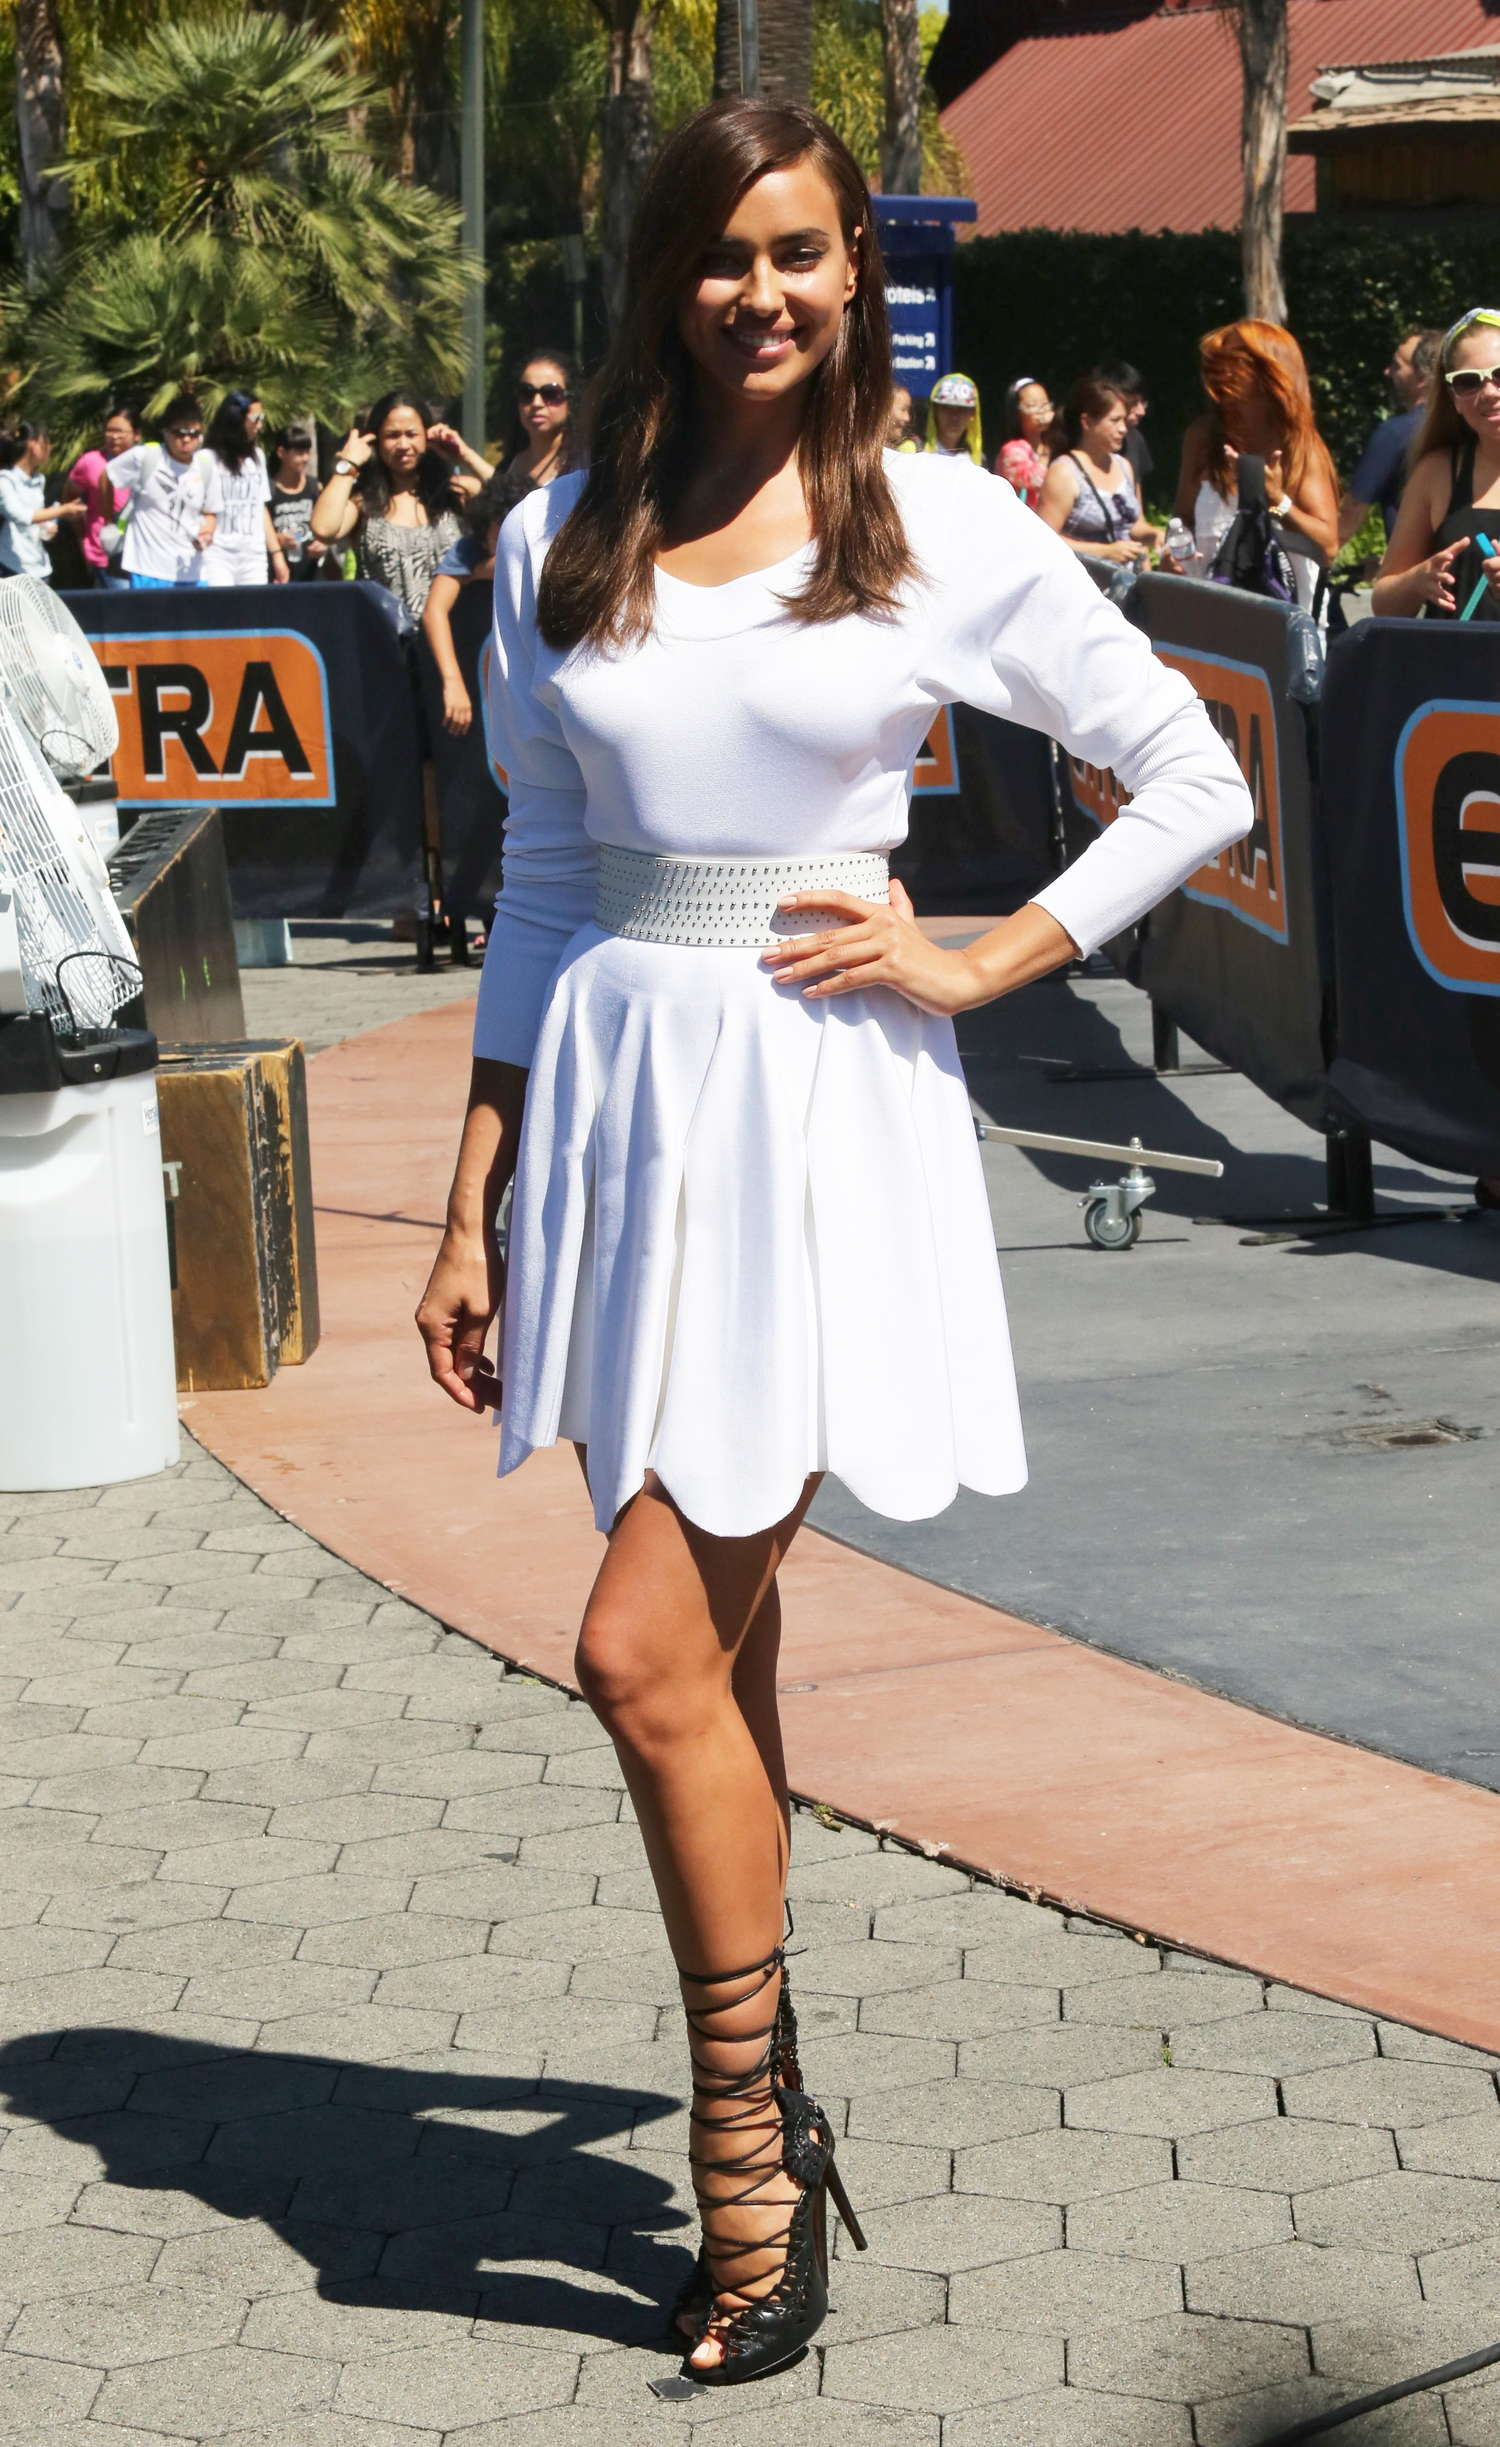 Irina Shayk 2014 : Irina Shayk in White Dress on Extra Set -07